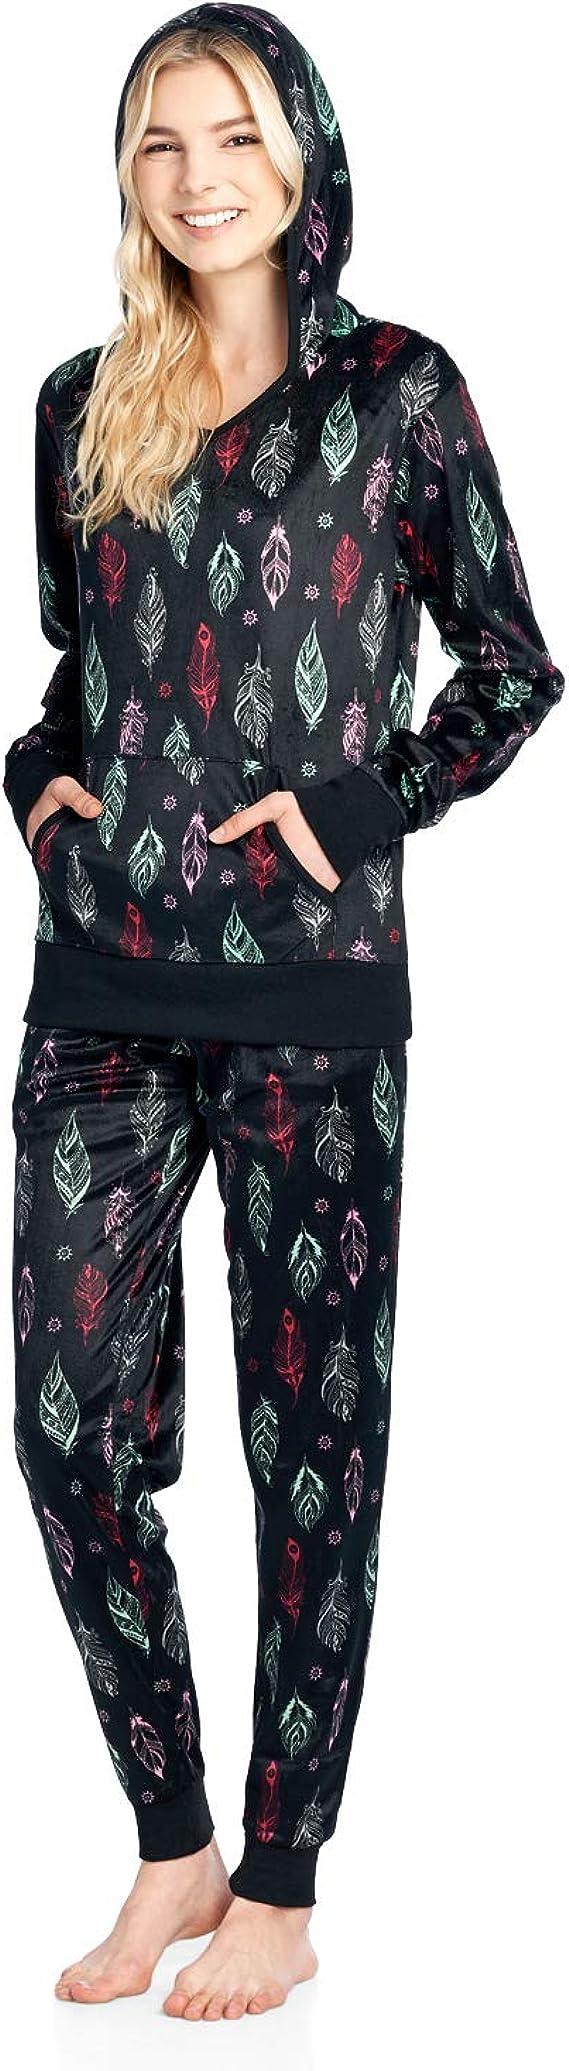 Ladies Heart Micro Fleece With Hood Twosie Pyjama Set